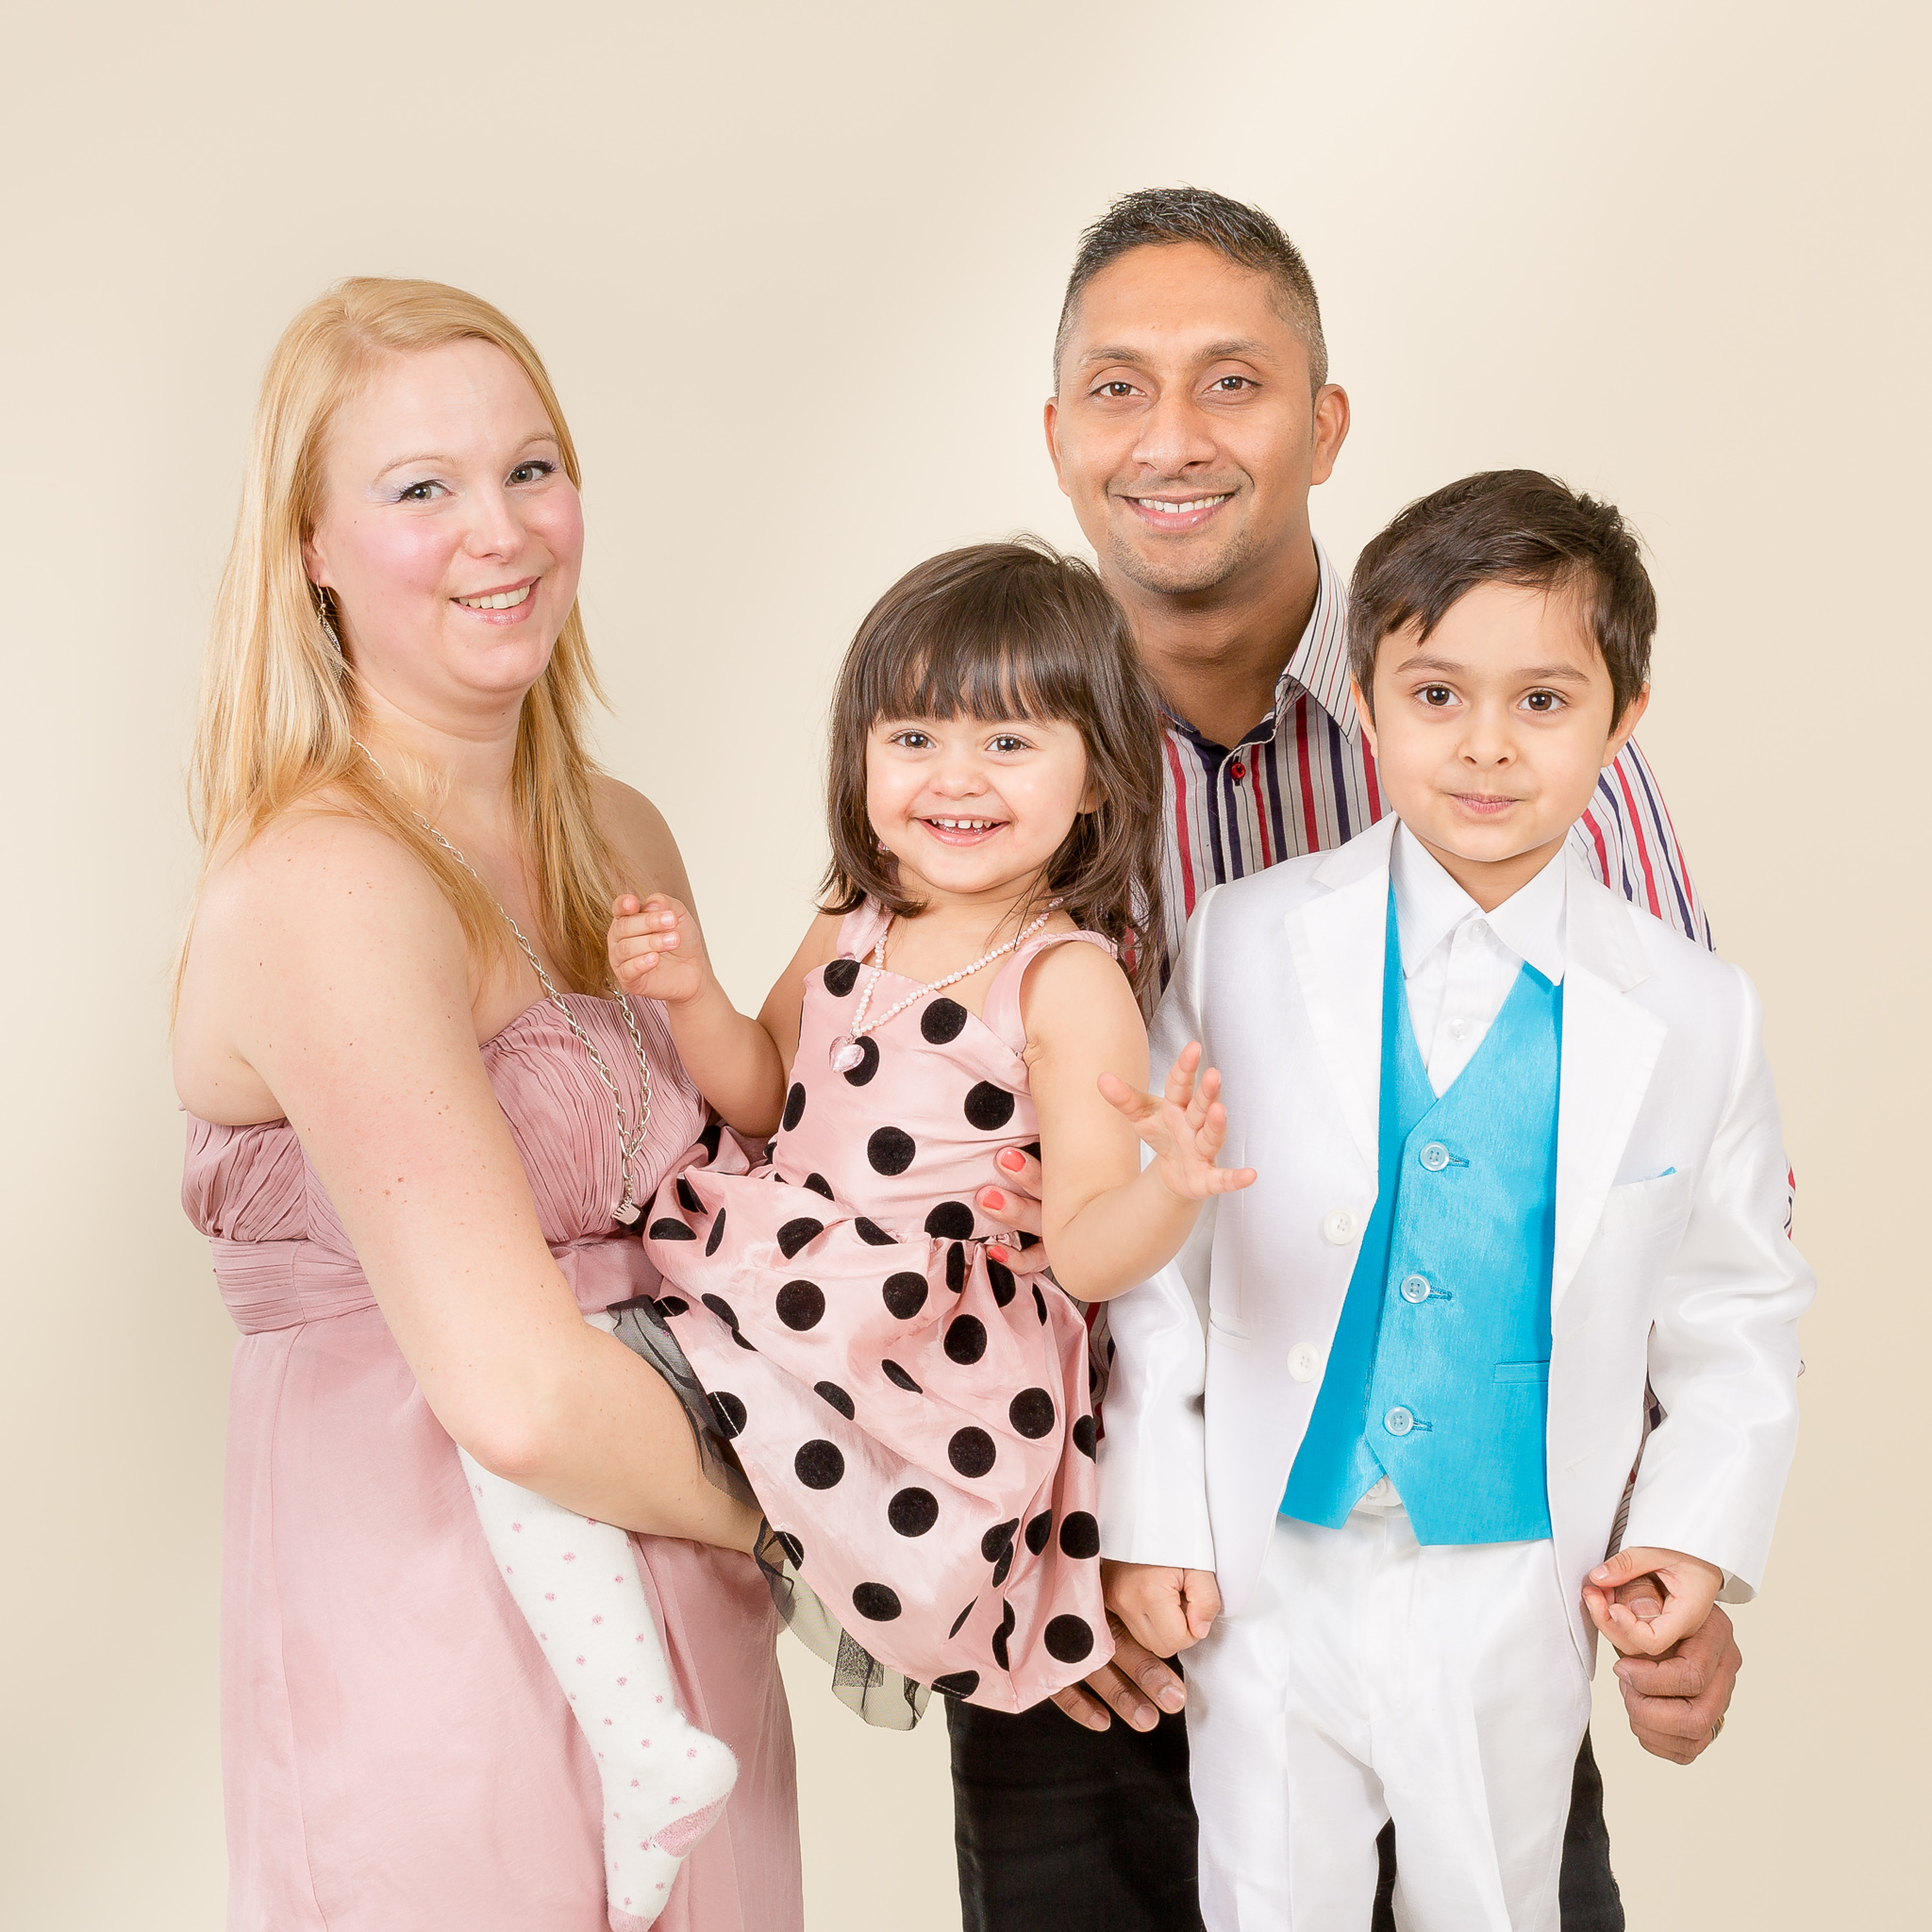 Familjefotografering - 999 kr